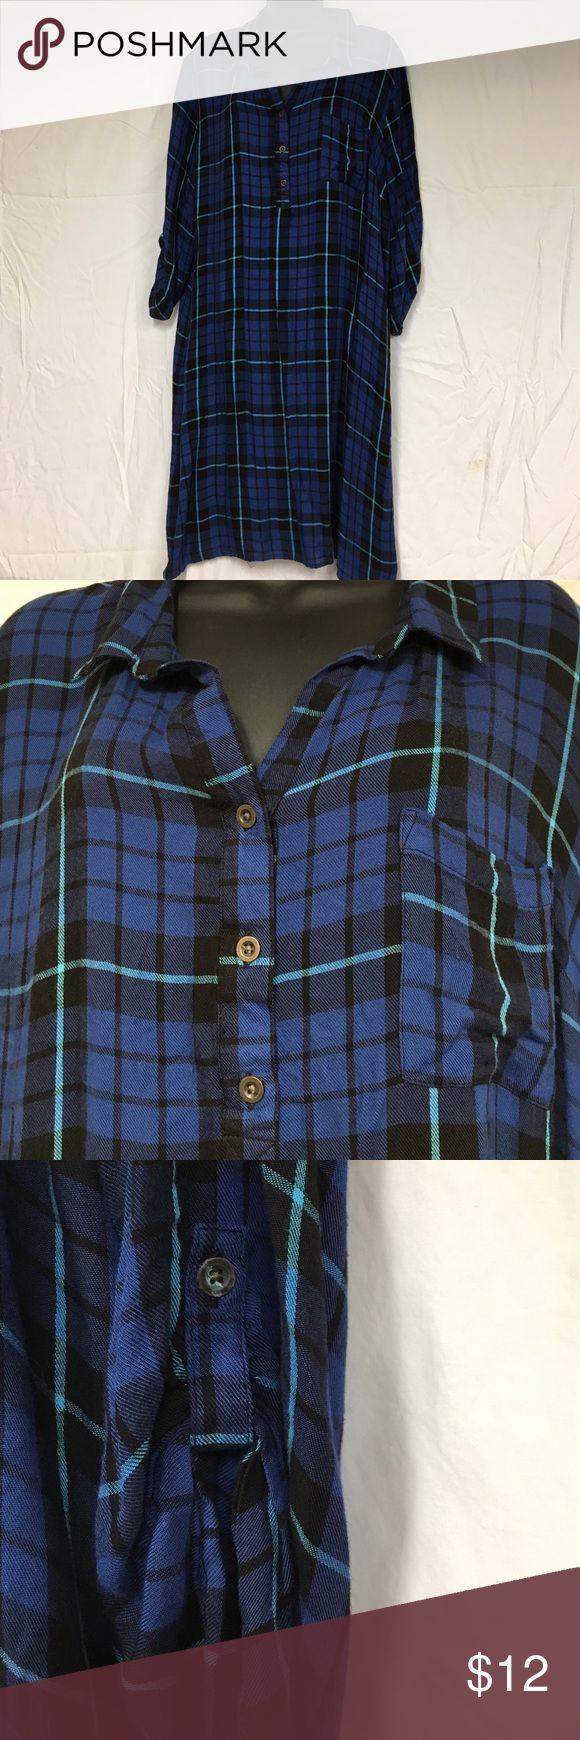 Blue & Black Flannel Shirt Dress, XL 16-18 Blue & Black Flannel Shirt Dress, XL 16-18 faded glory Dresses Midi